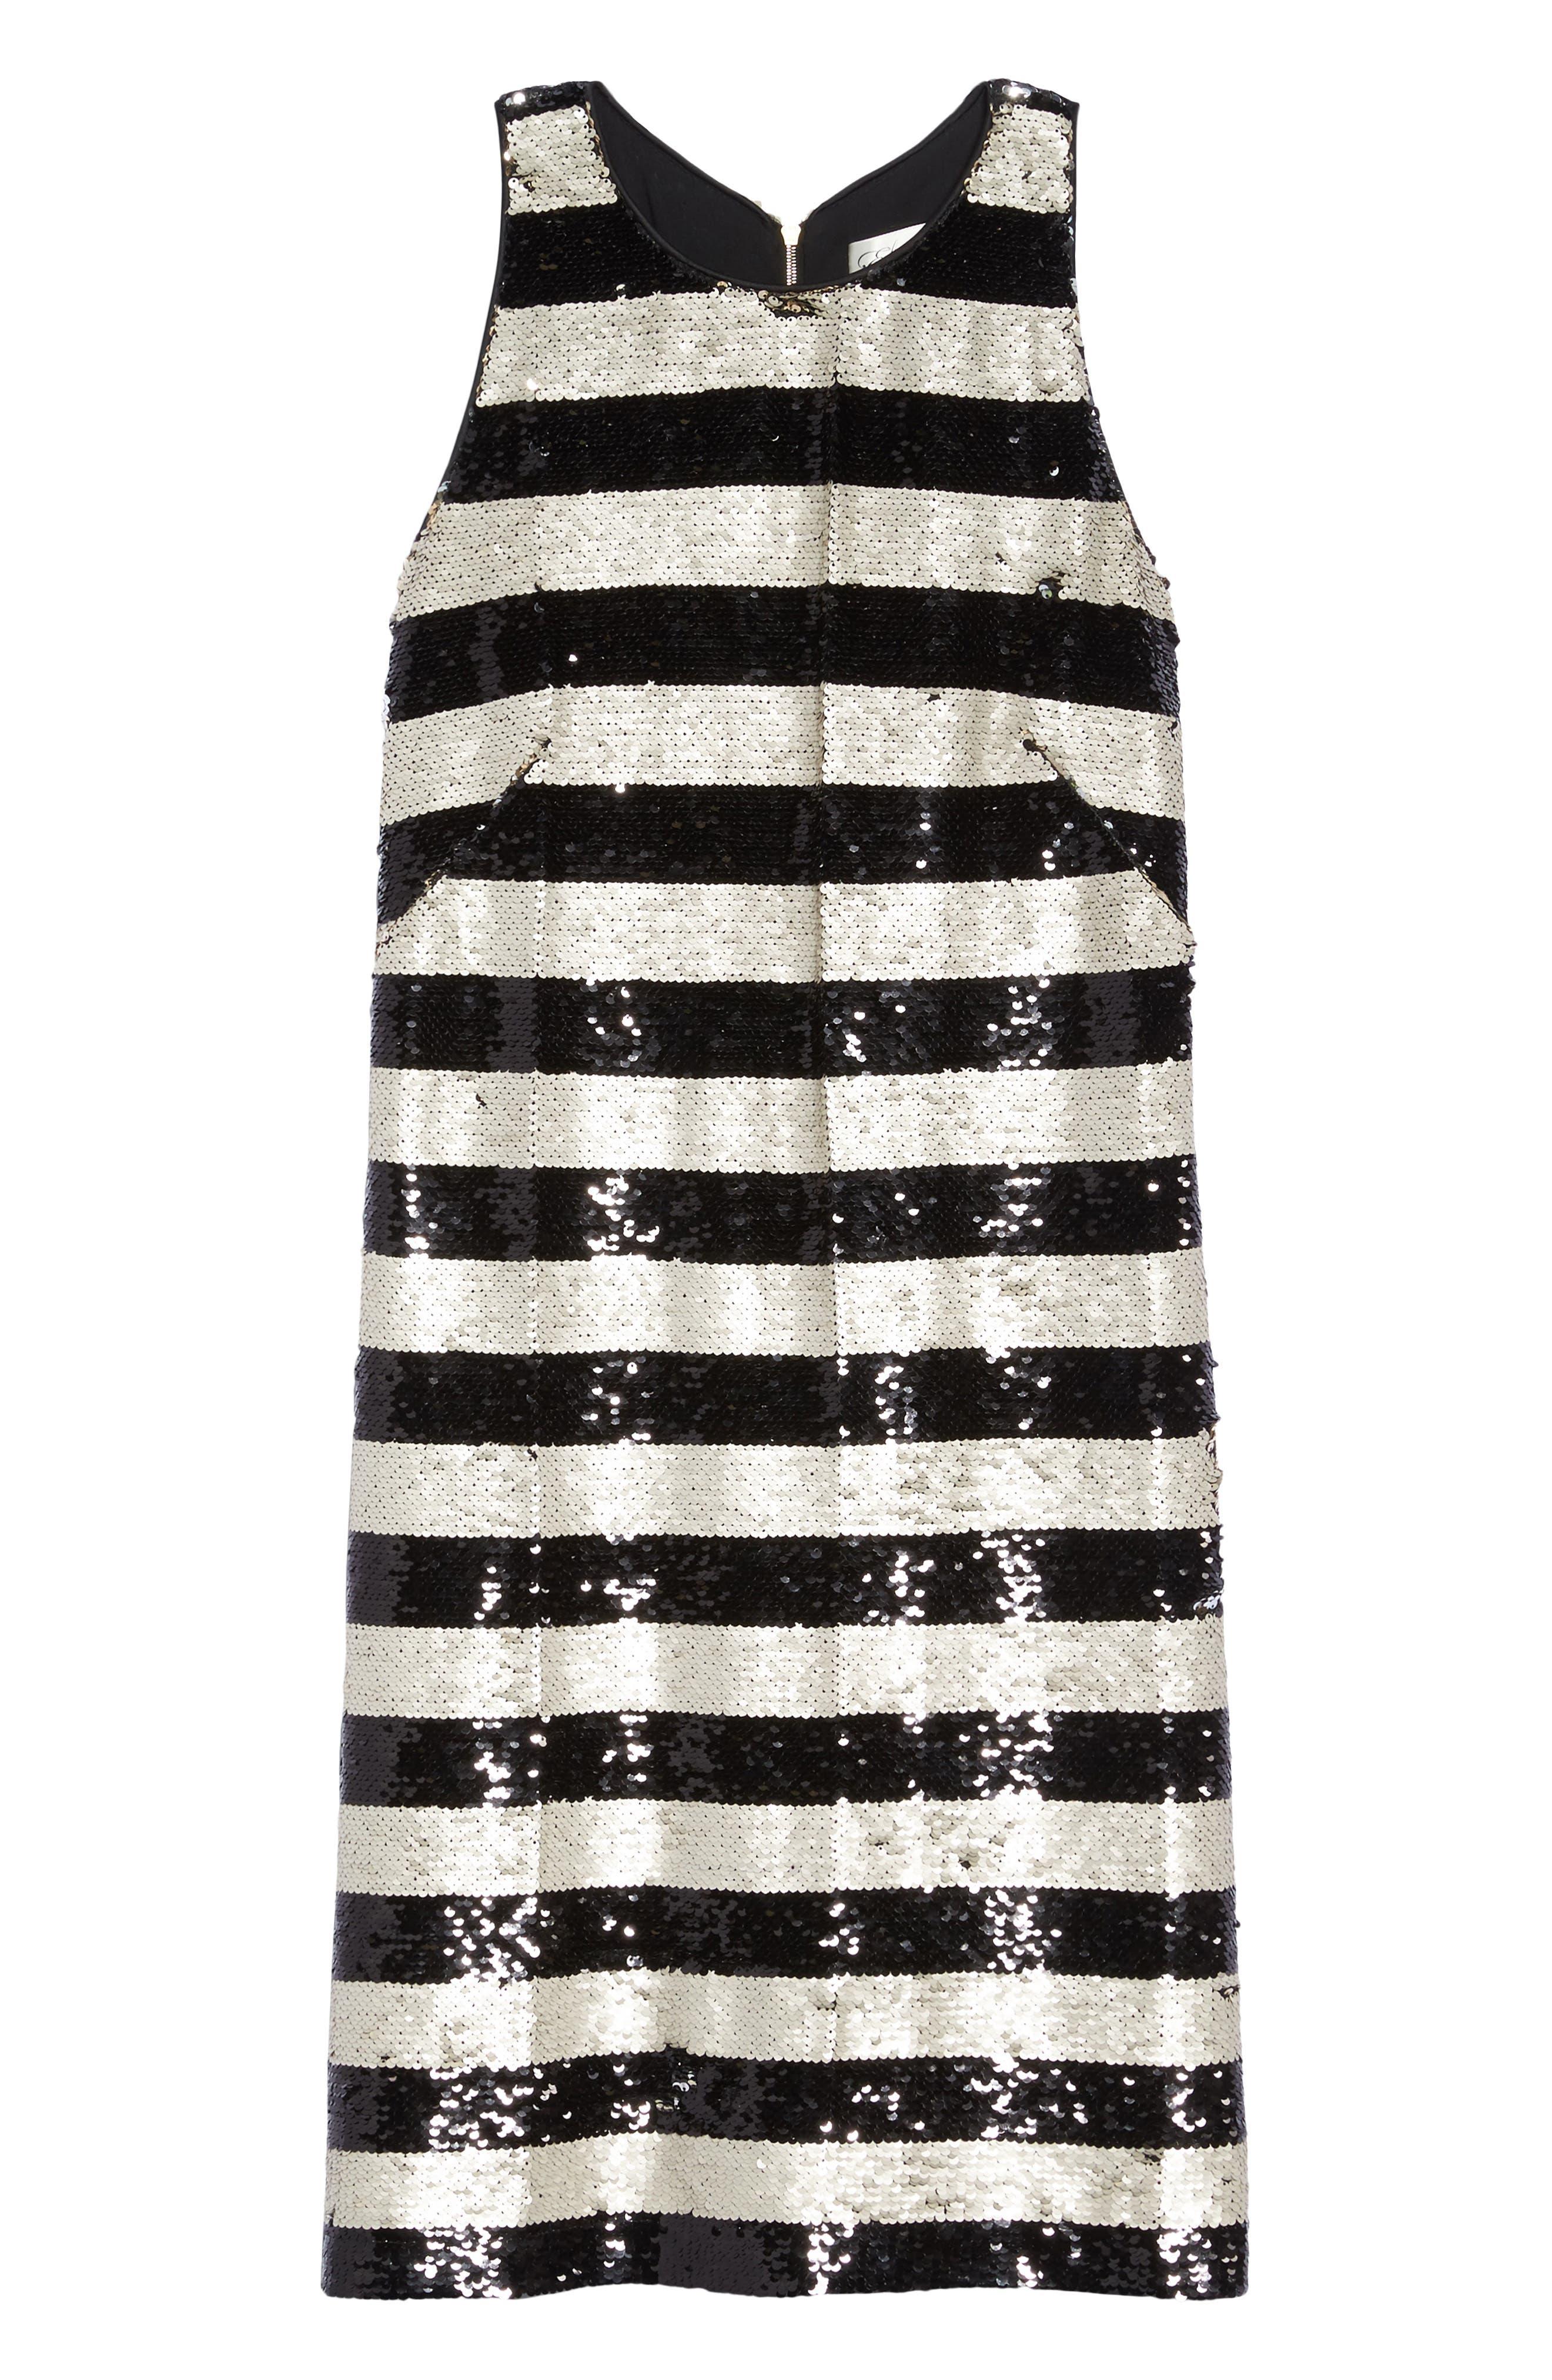 Reversible Stripe Sequin Shift Dress,                             Alternate thumbnail 6, color,                             006